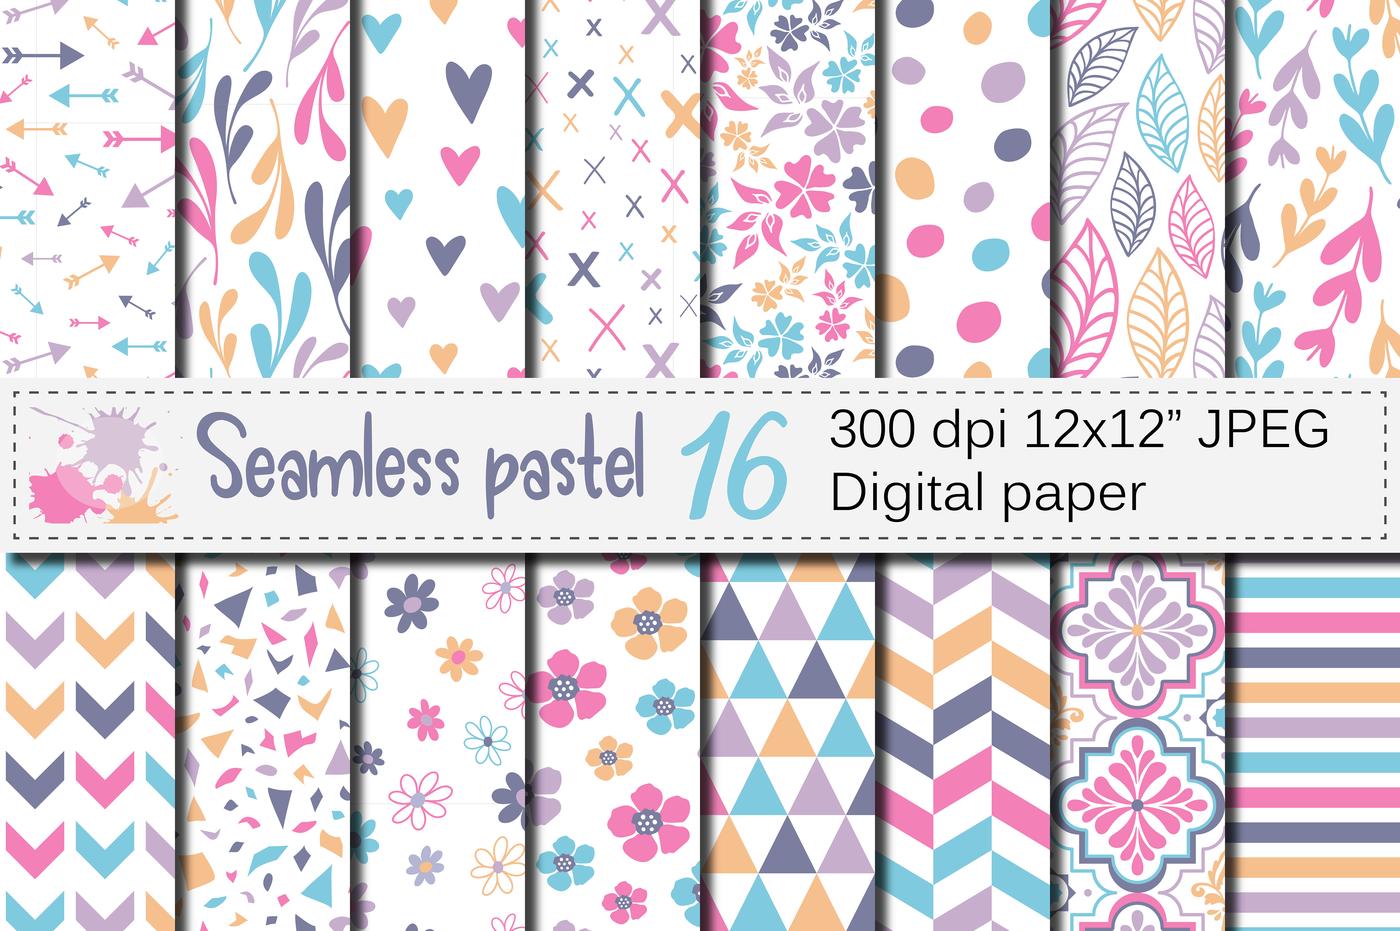 Seamless Pastel Patterns Pastel Geometric And Floral Digital